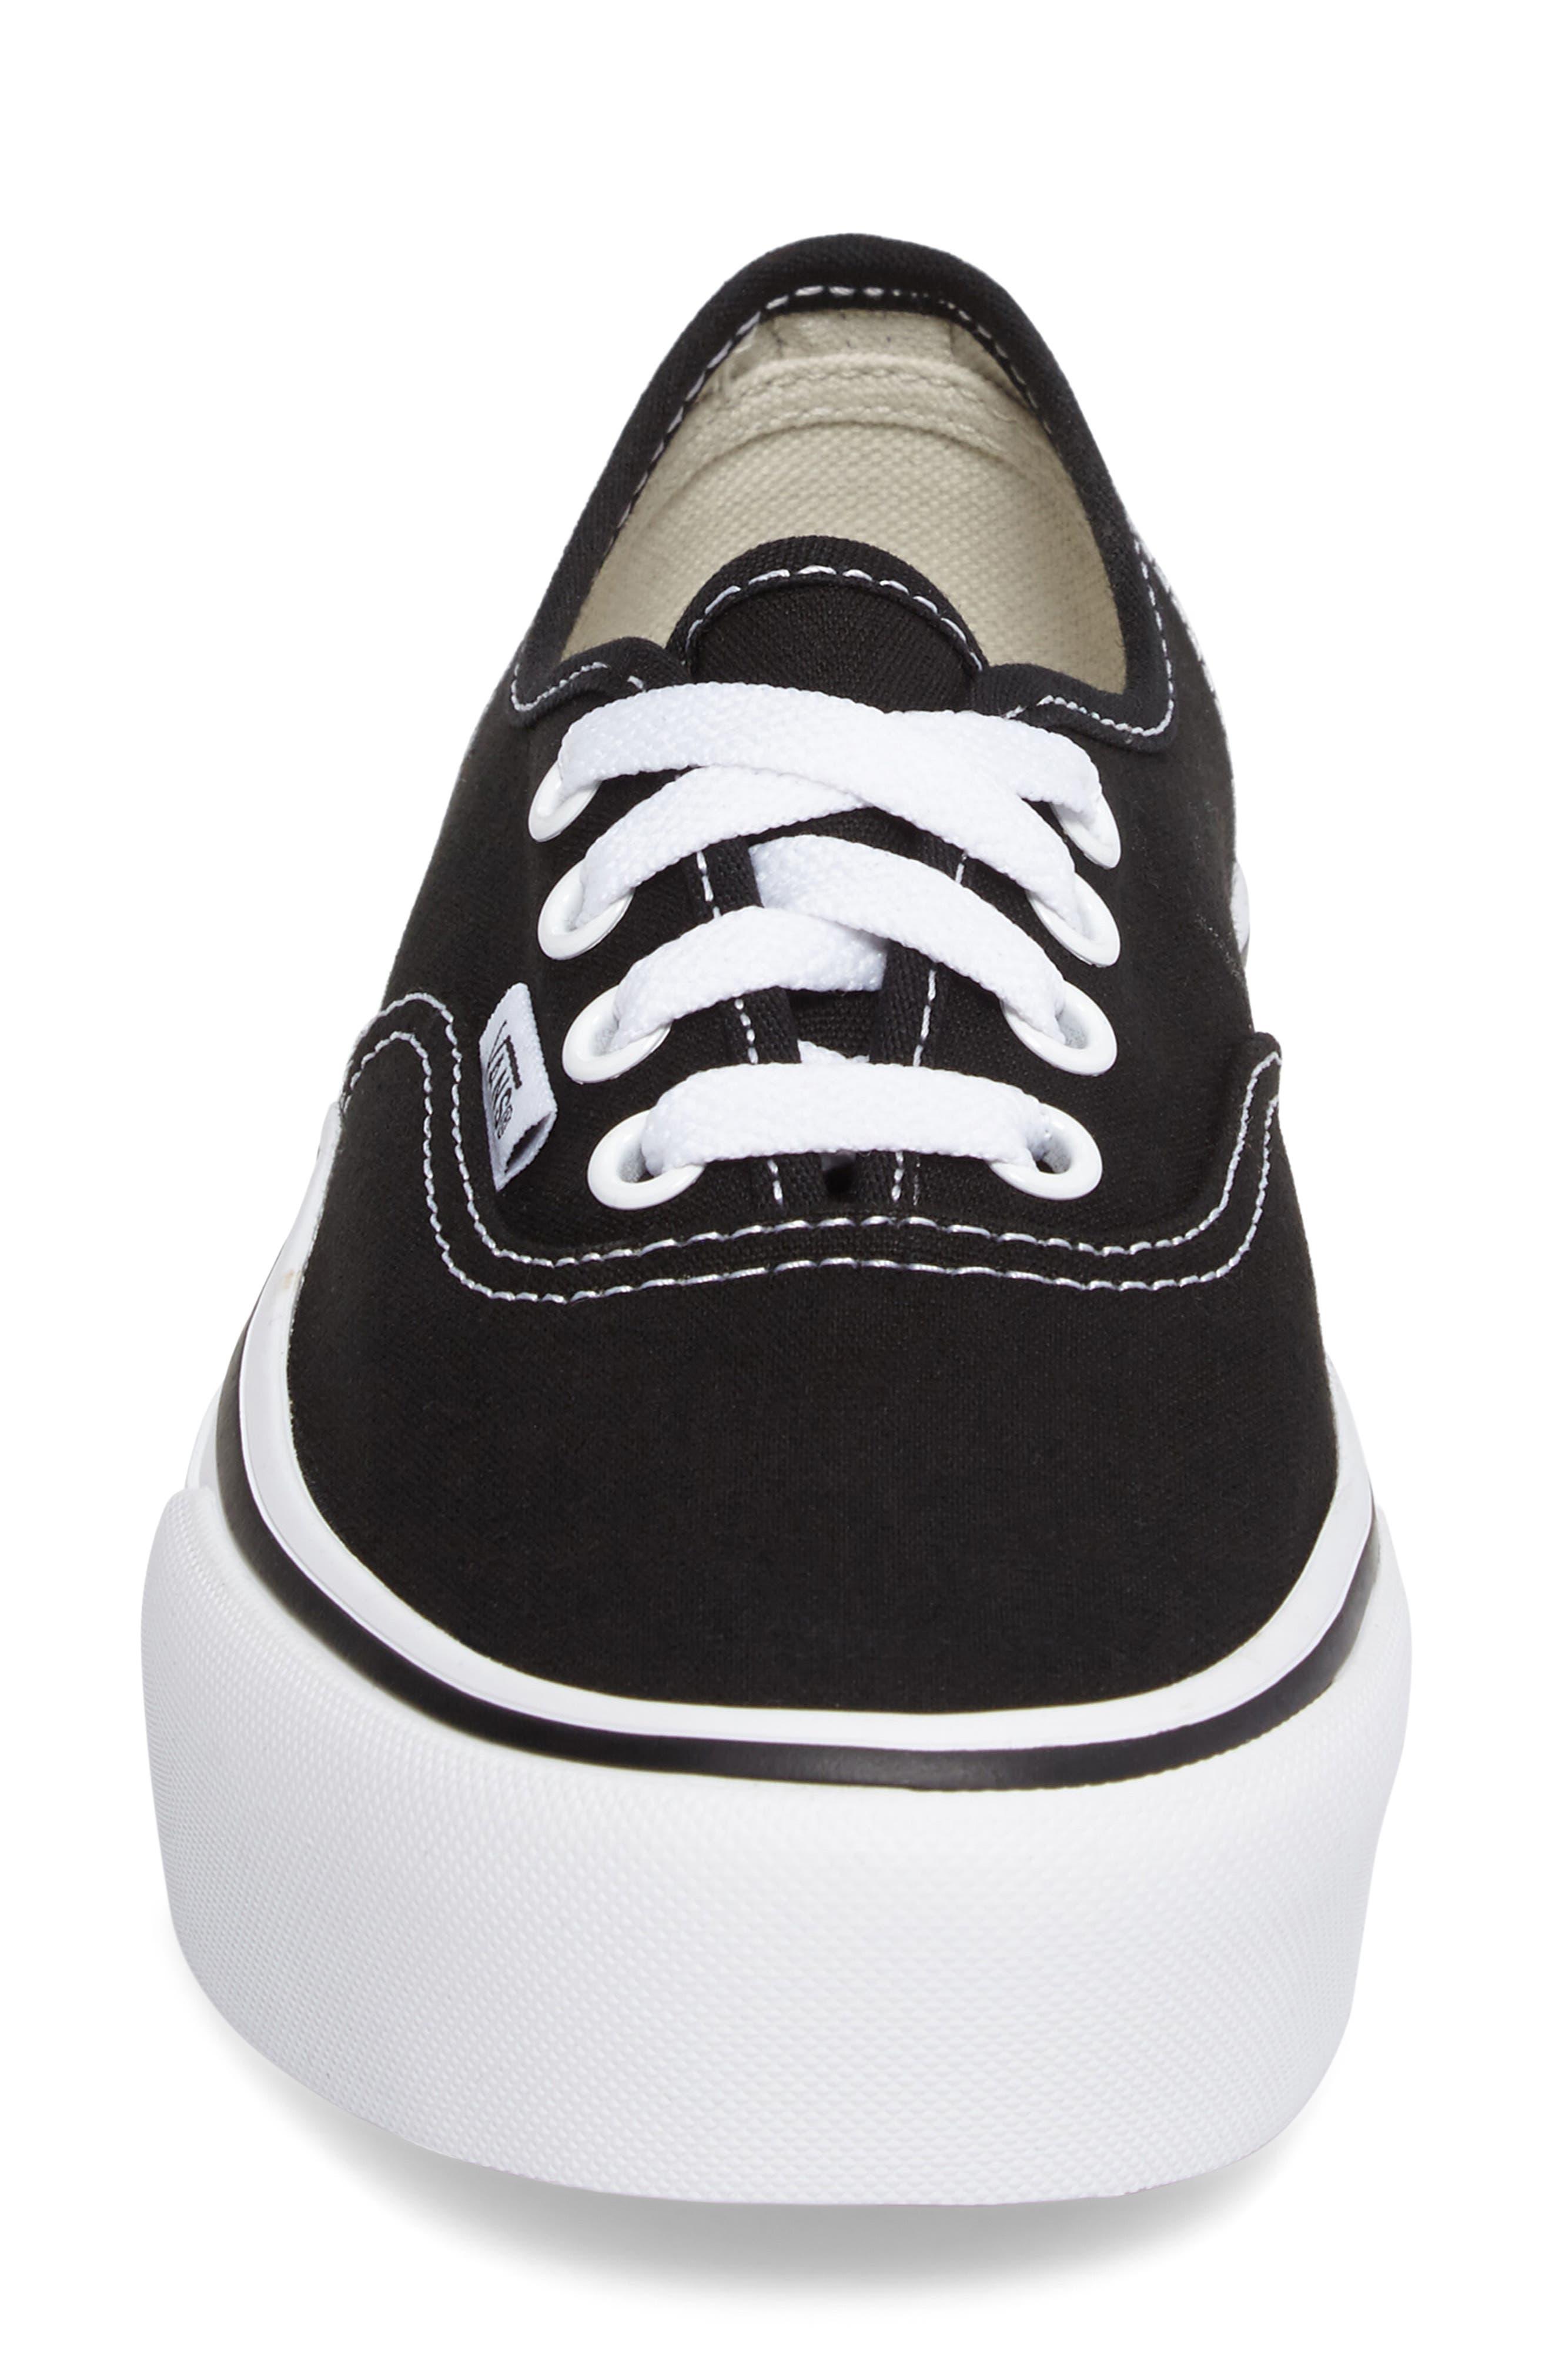 VANS, 'Authentic' Platform Sneaker, Alternate thumbnail 4, color, BLACK/ WHITE